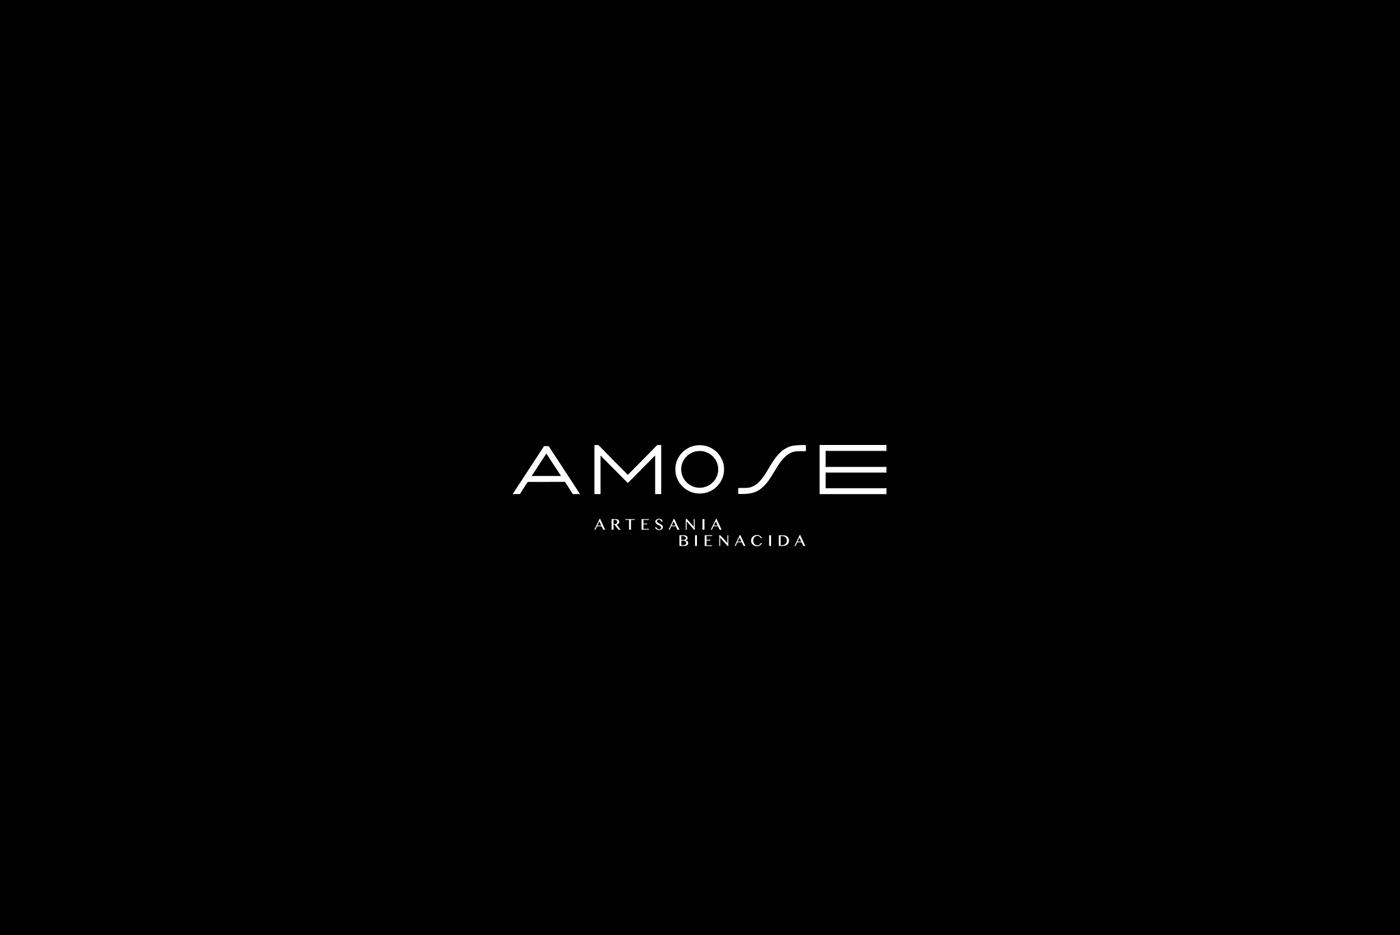 Amose on Behance